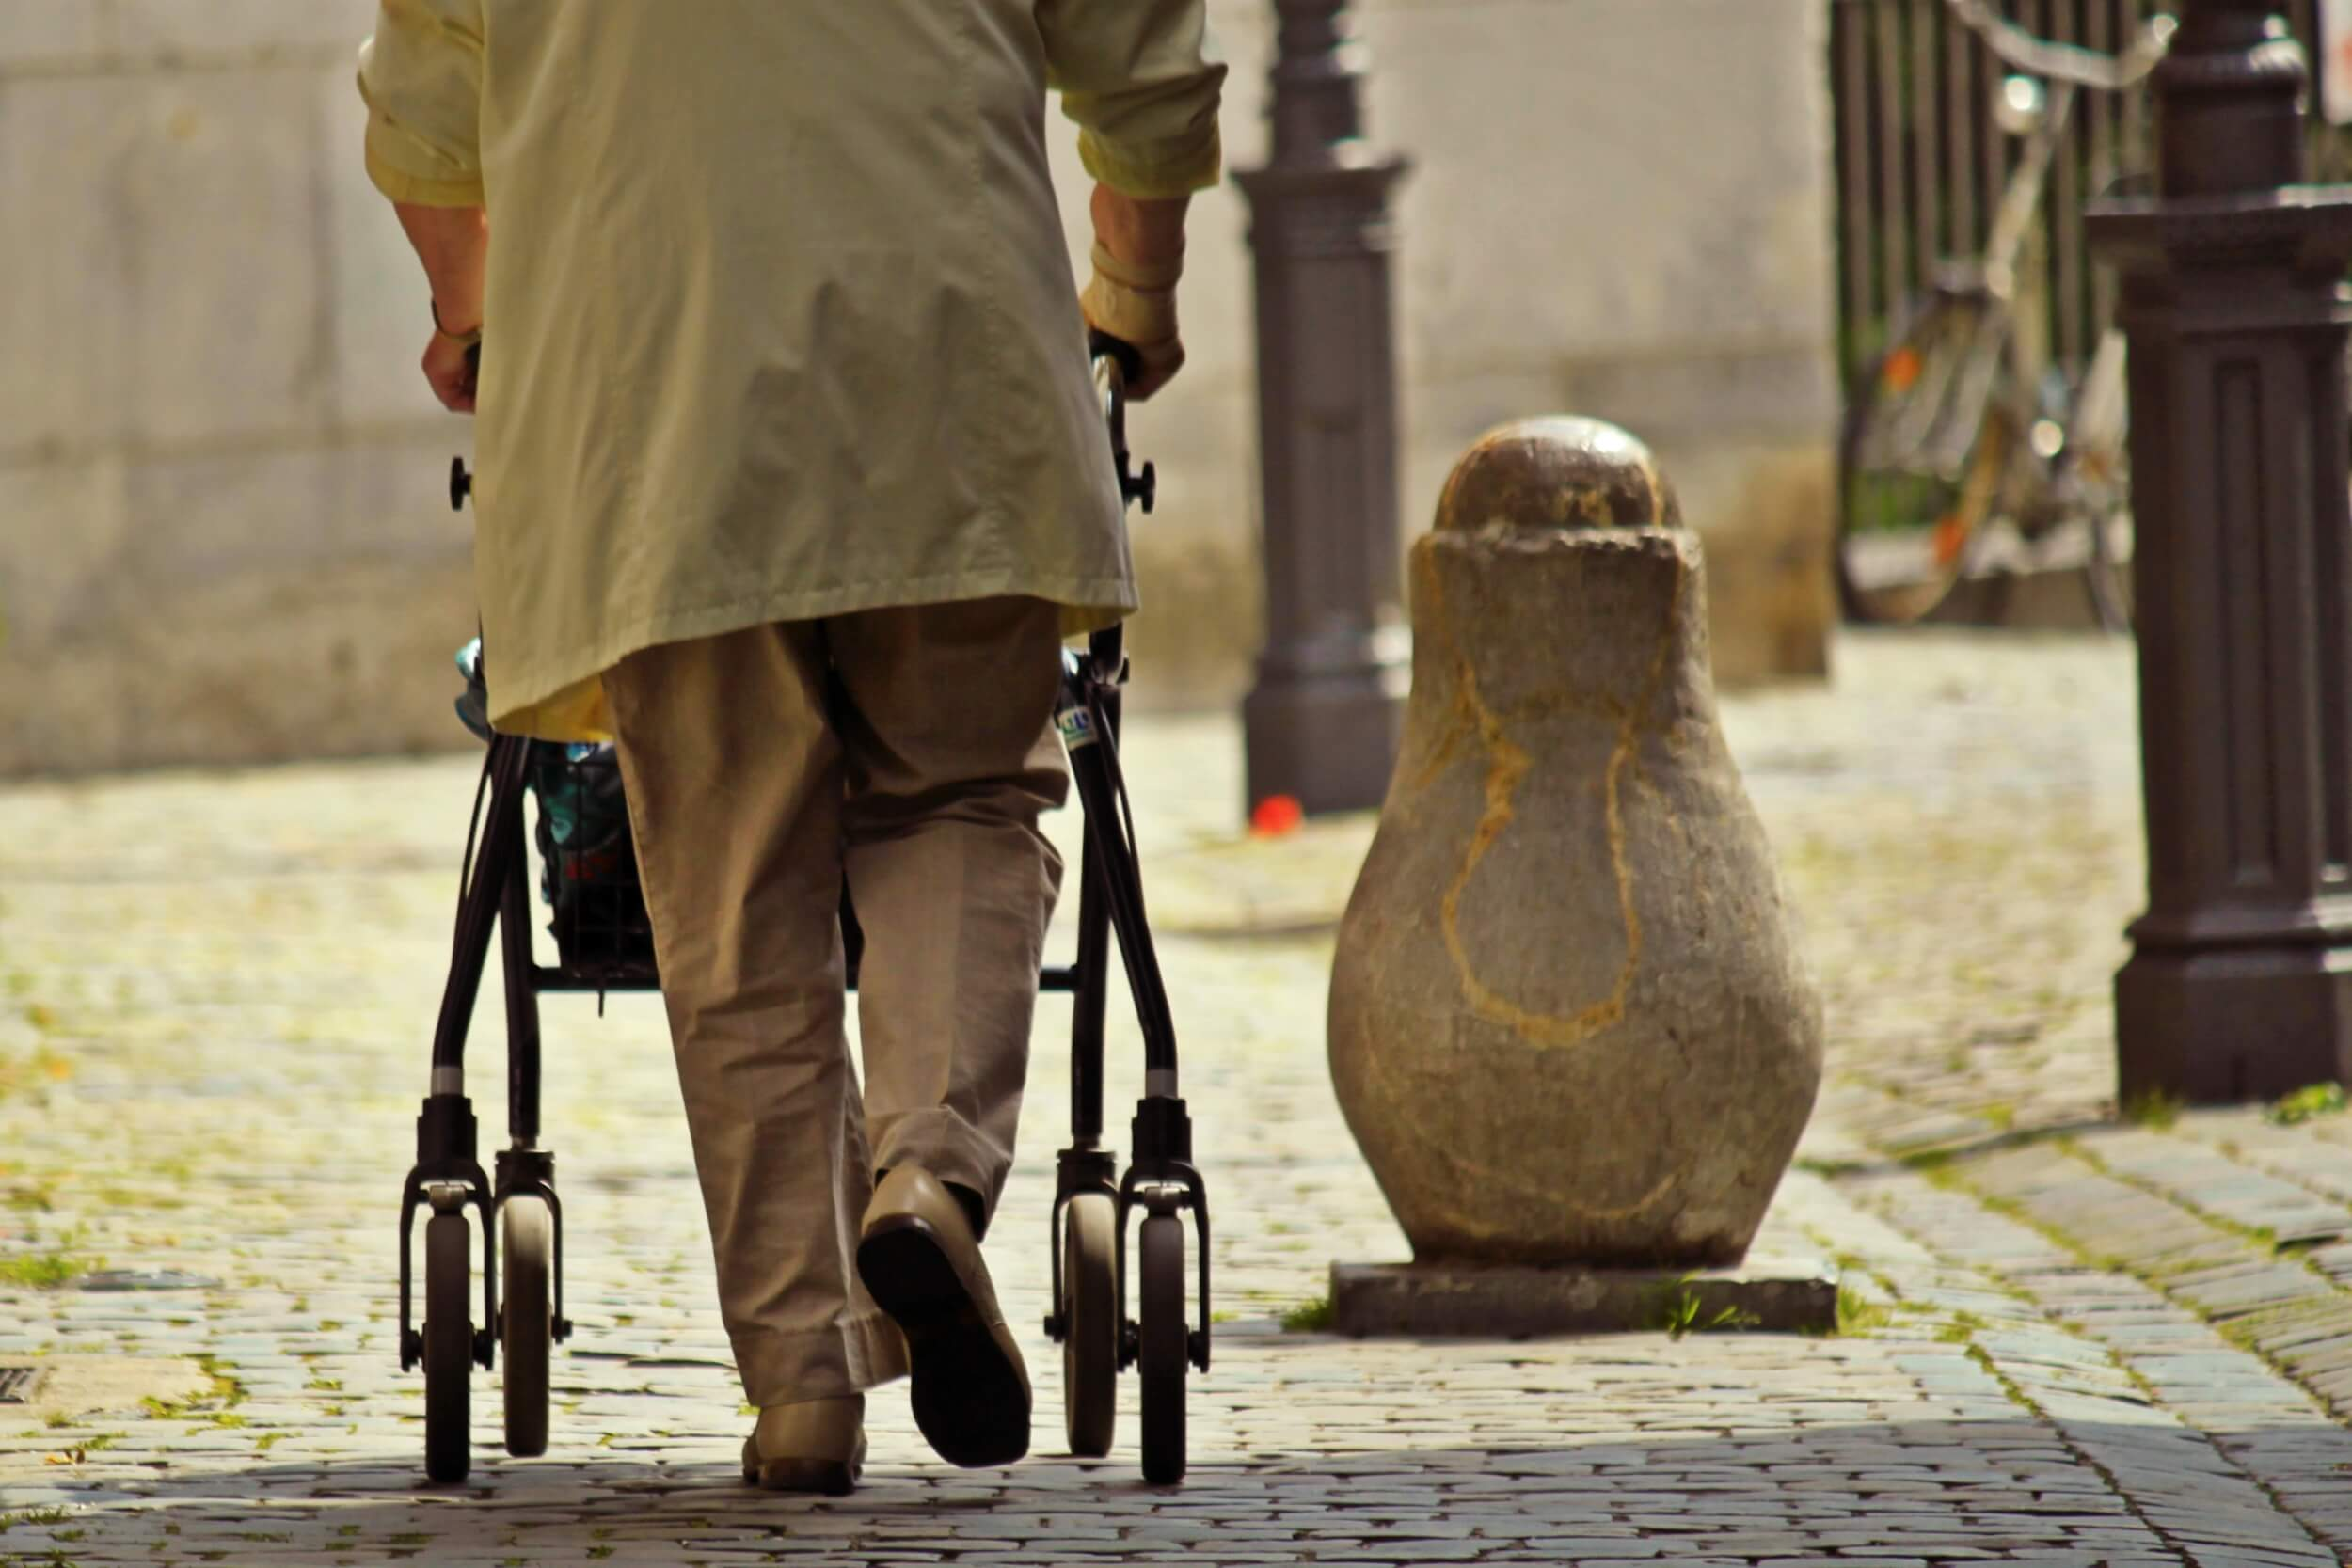 Pflege | Seniorin mit Rollator im Seniorenheim (c) cocoparisienne / pixabay.de